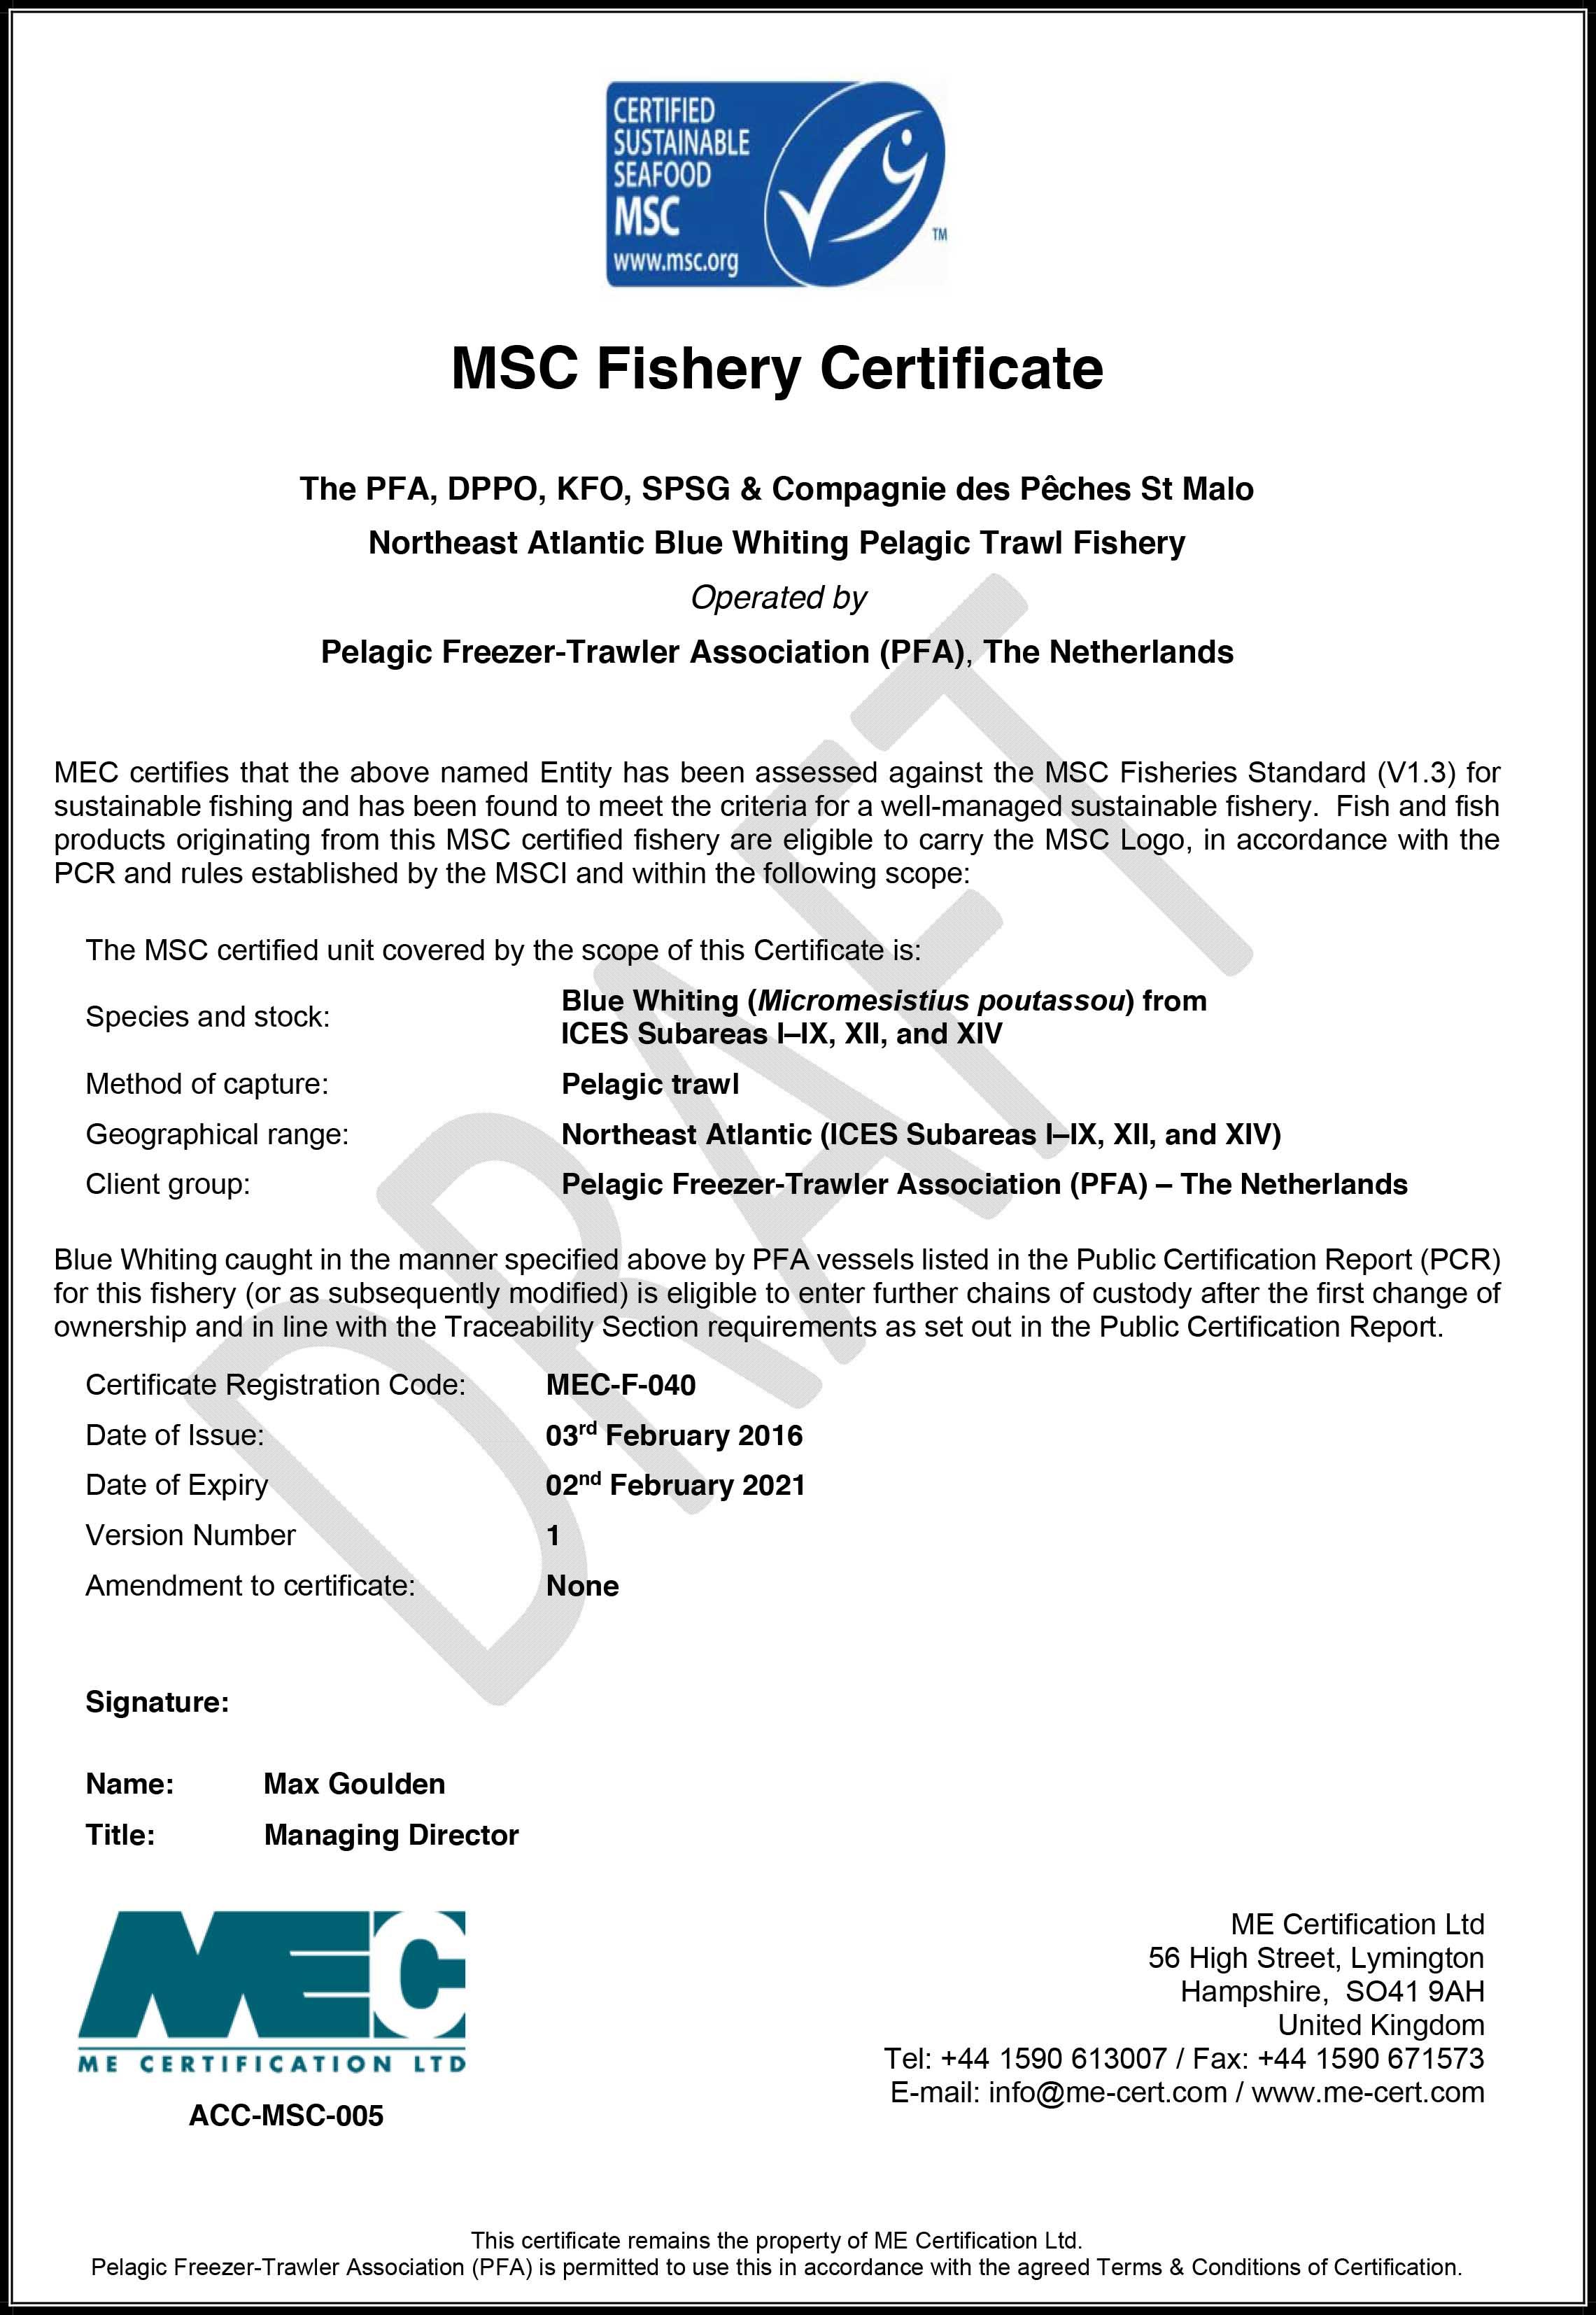 MSC certification for Blue Whiting fishery > Parlevliet & van der Plas